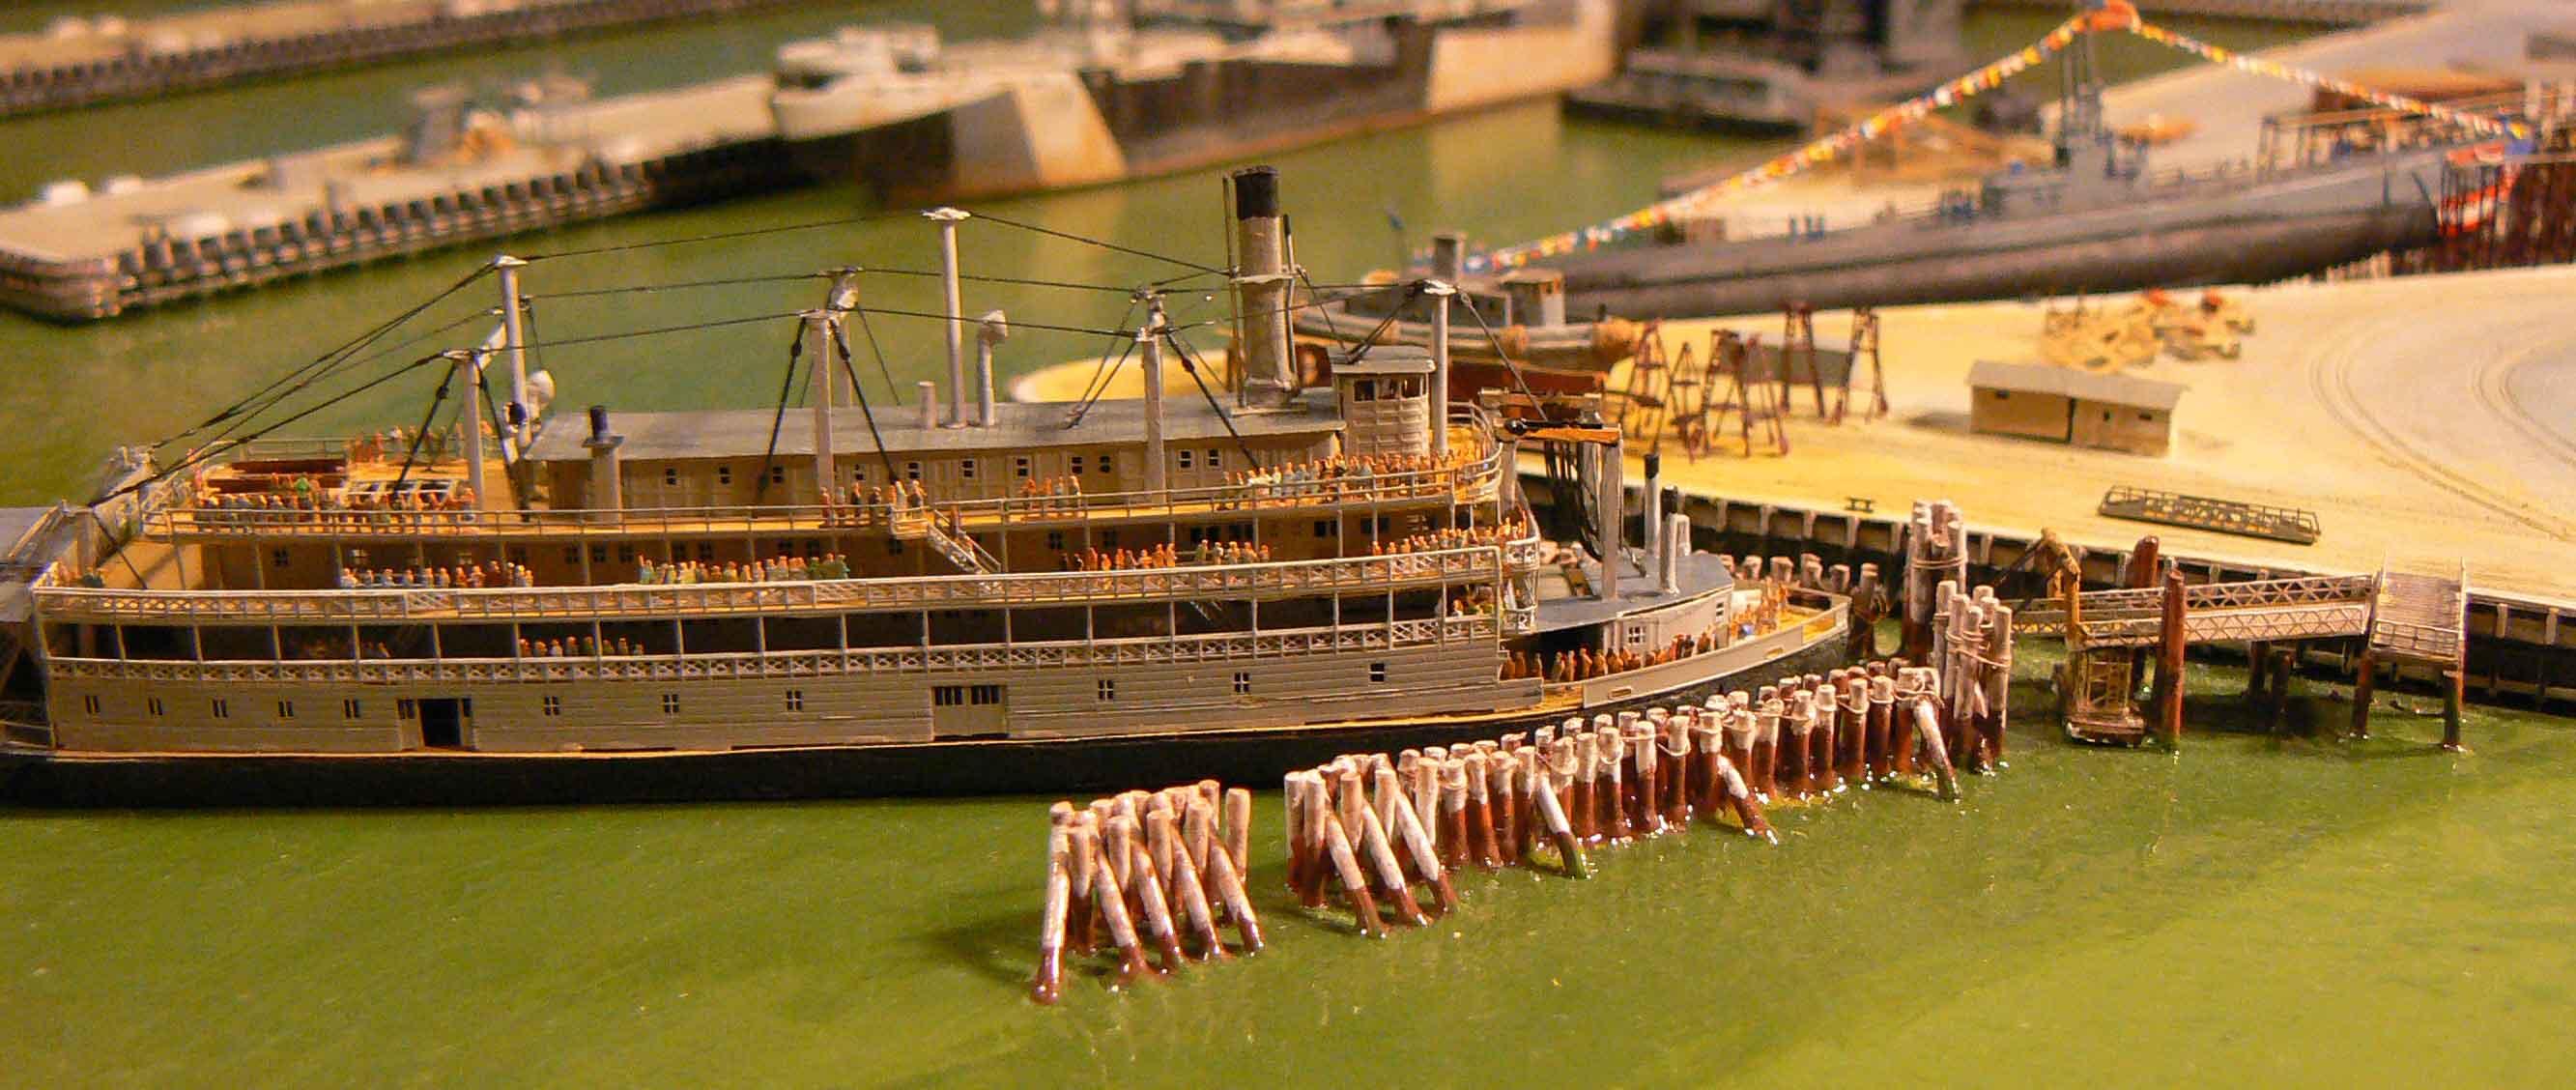 MARE ISLAND NAVAL SHIP YARD  1/700 Eccl5h